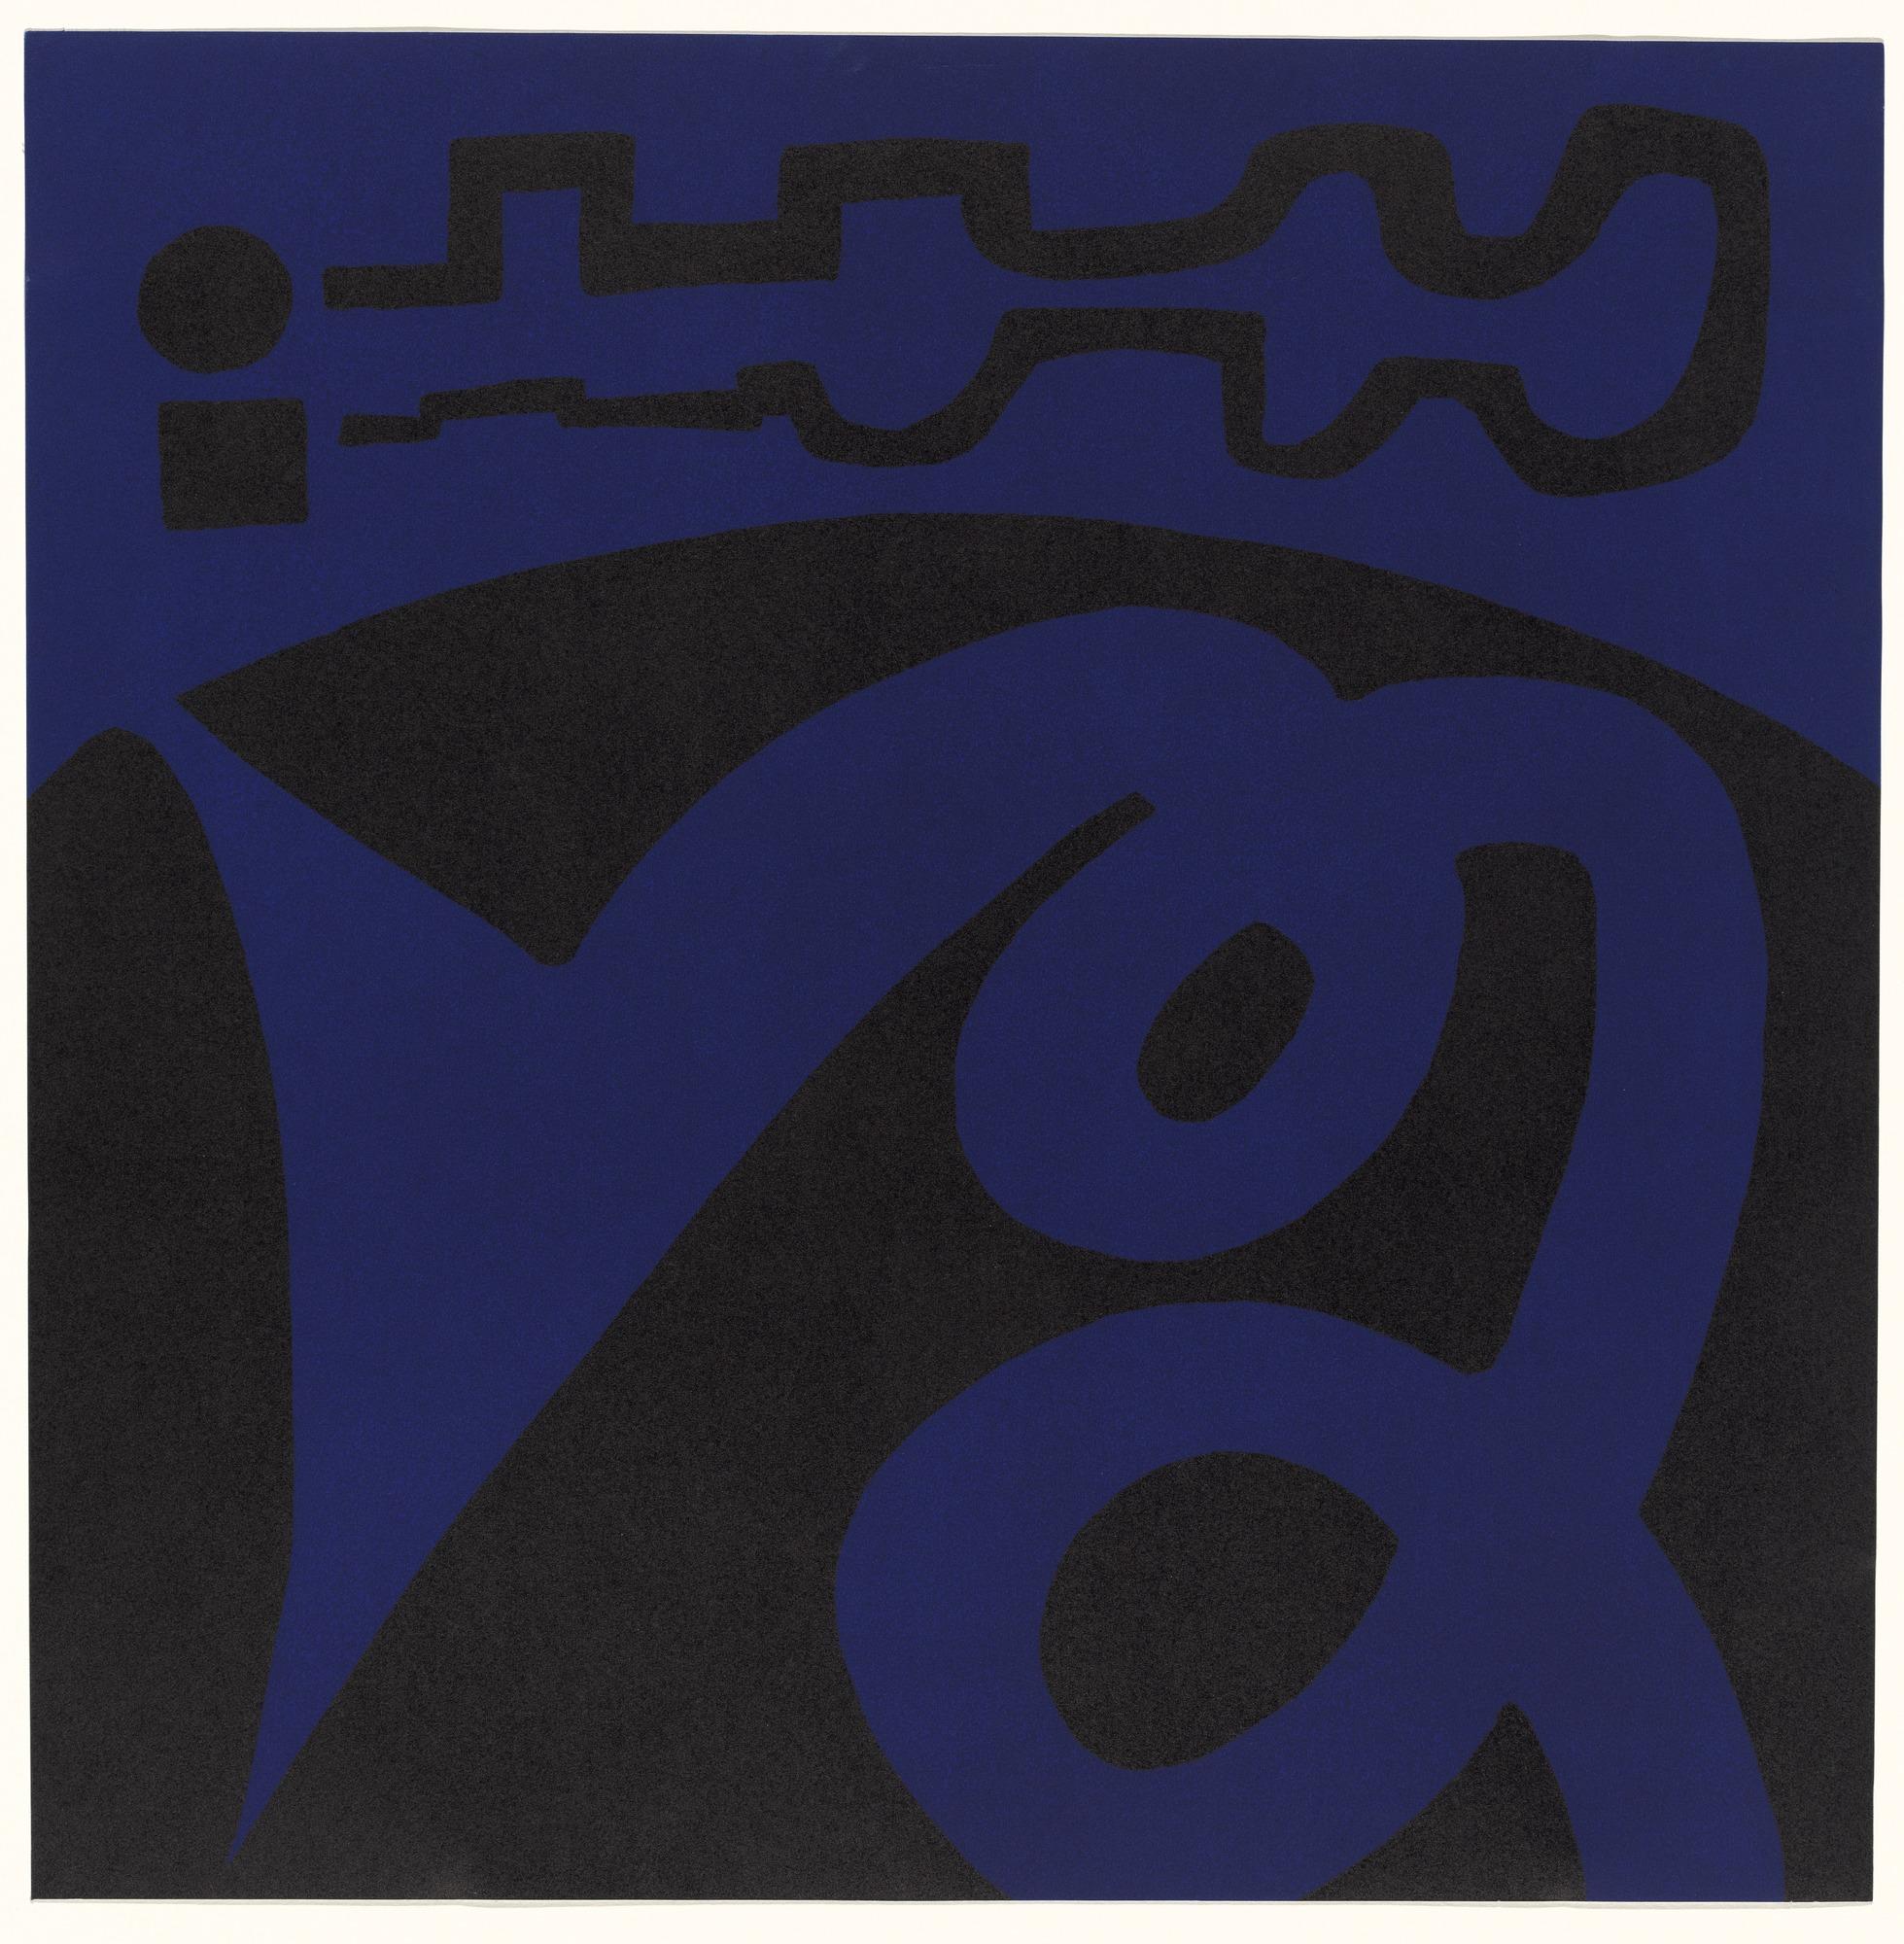 The Museum of Modern Art New York, New York - Ramdam, Gift of Betsy Wittenborn Miller and Robert Miller in honor of Carolyn Lanchner.Ten, Harold and Hester Diamond and Mrs. Joseph James Akston FundsFirst Light 23, Mrs. W. Murray Crane Fund